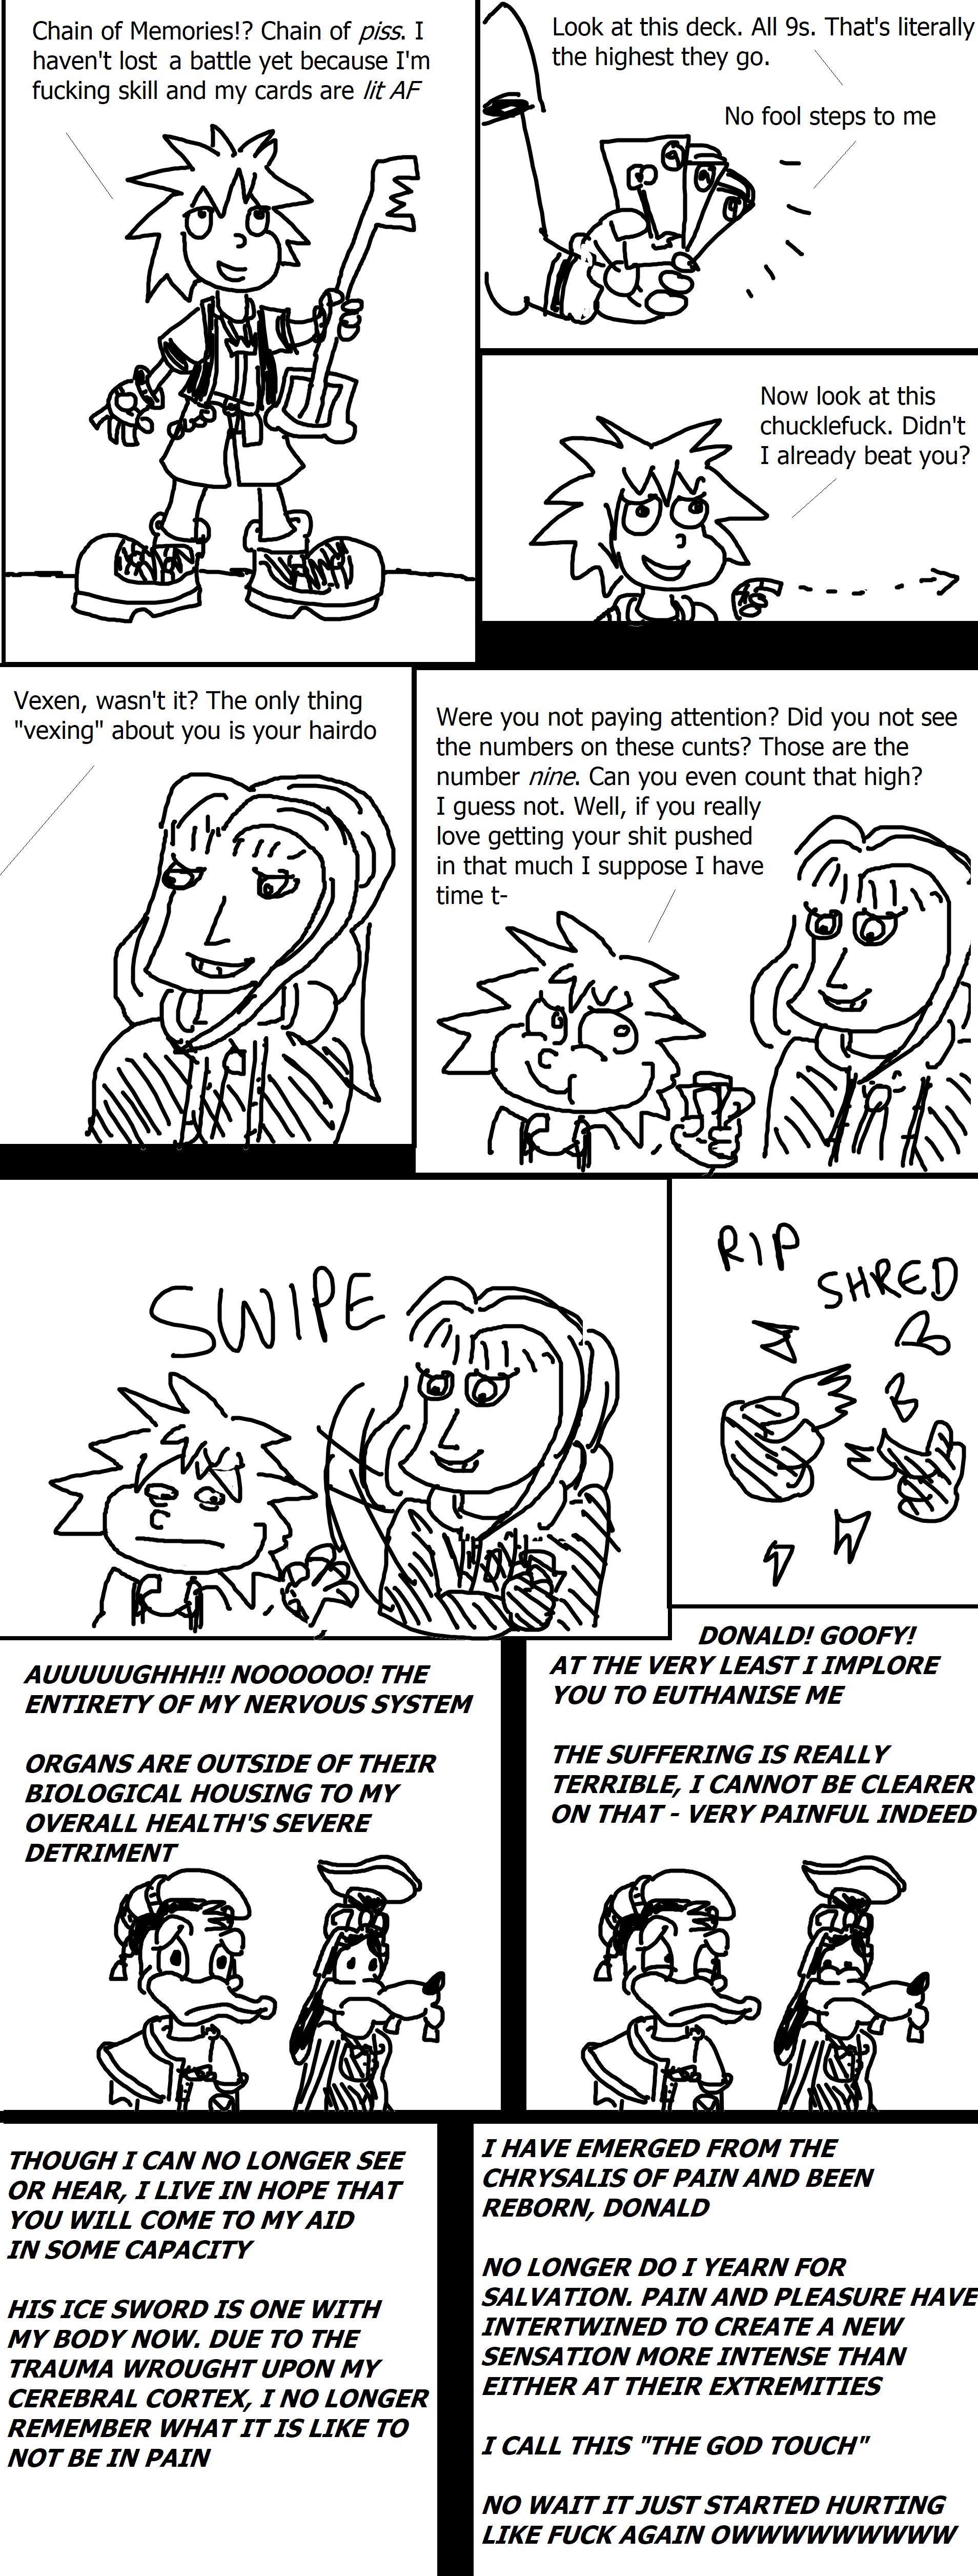 402. Kingdom Hearts: Chain of Memories